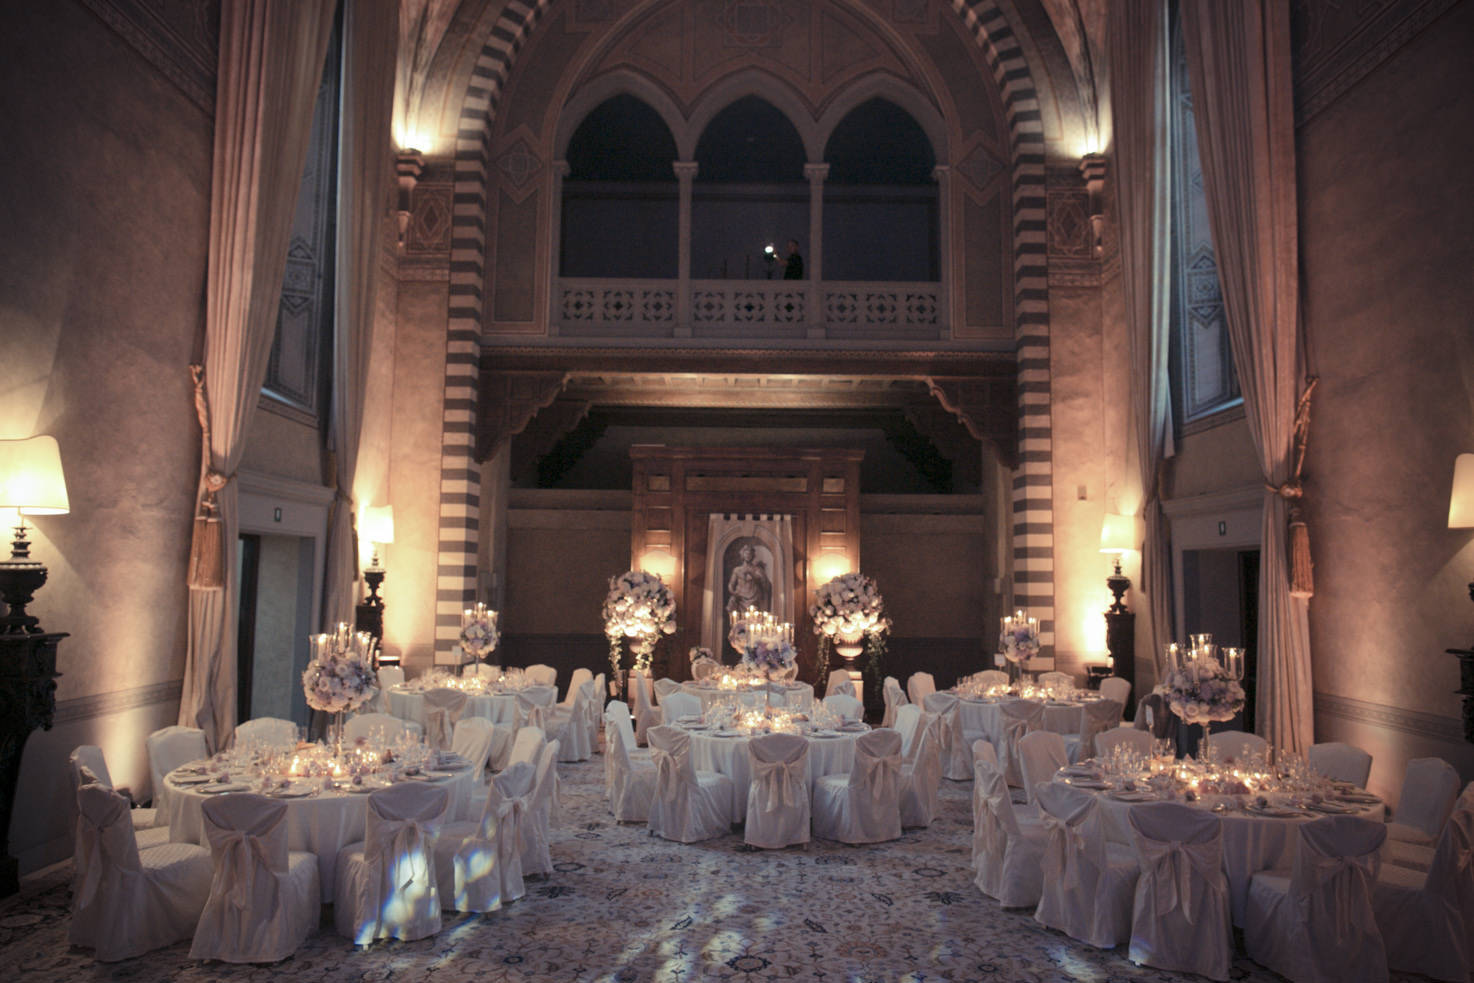 Wedding banquet at Four Seasons Hotel